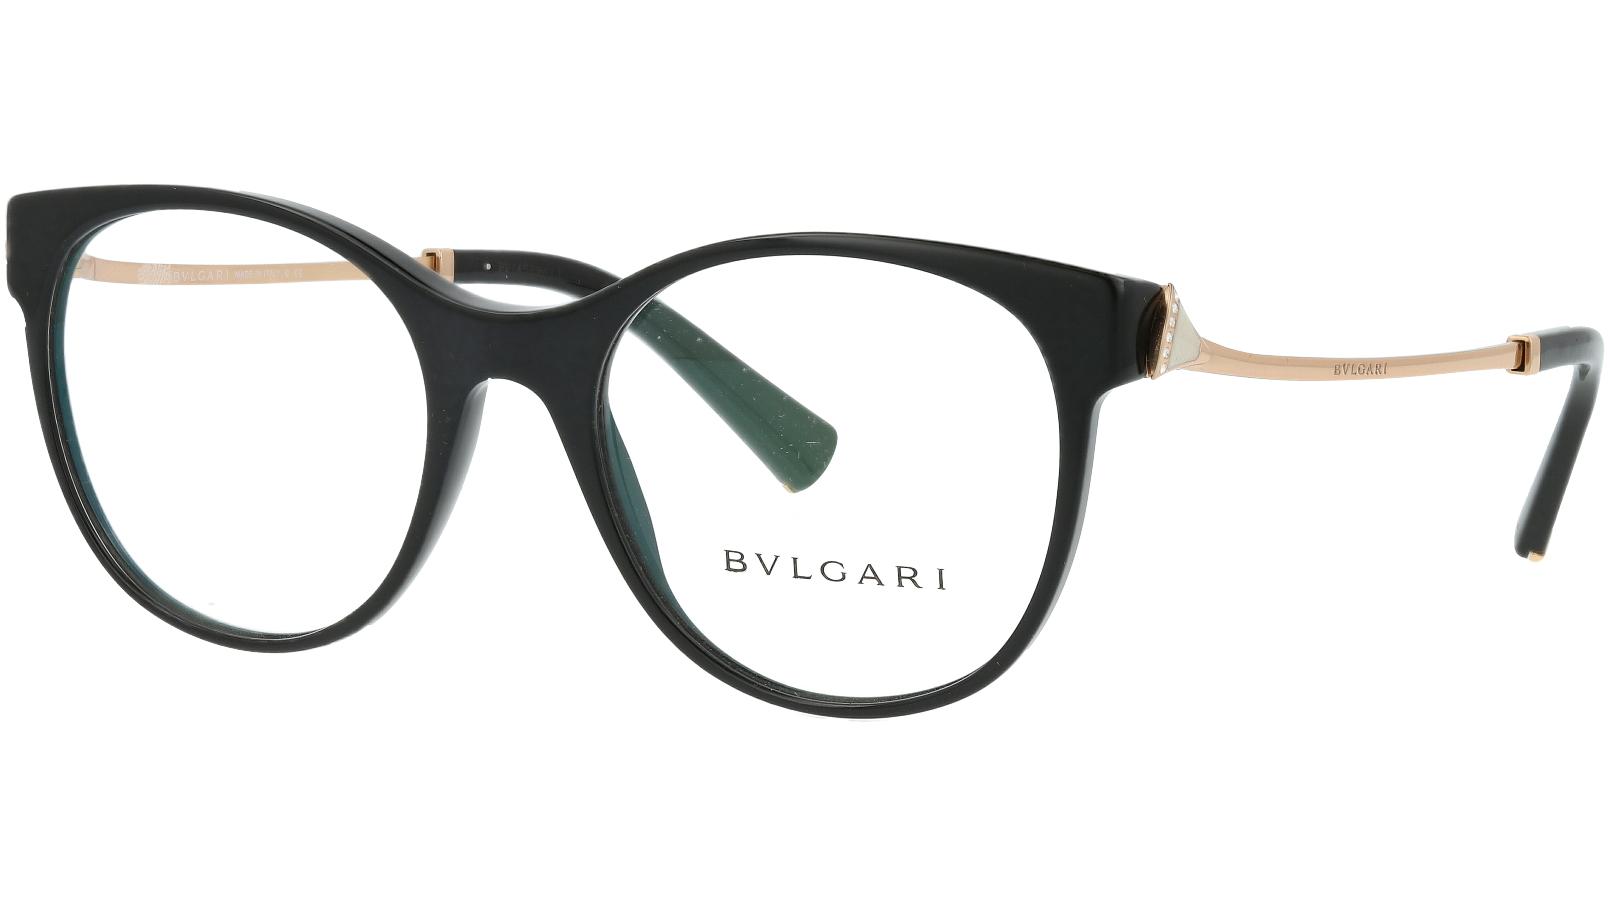 BVLGARI BV4160B 501 53 BLACK Glasses